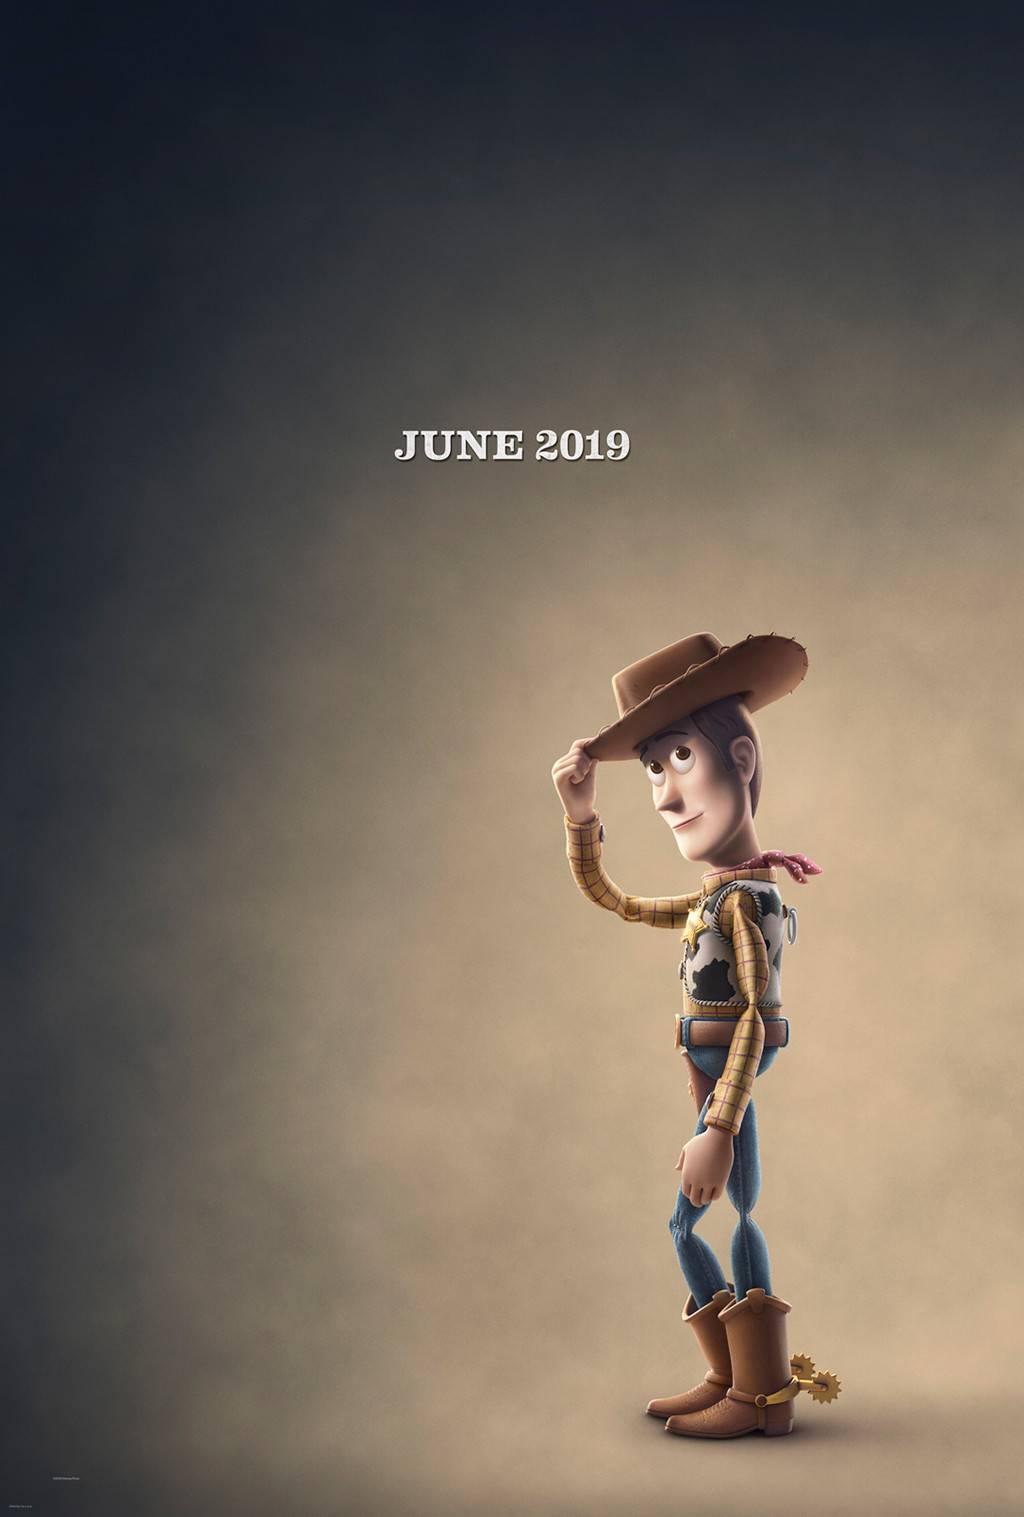 Primer póster promocional de Toy Story 4 // Revista Empire